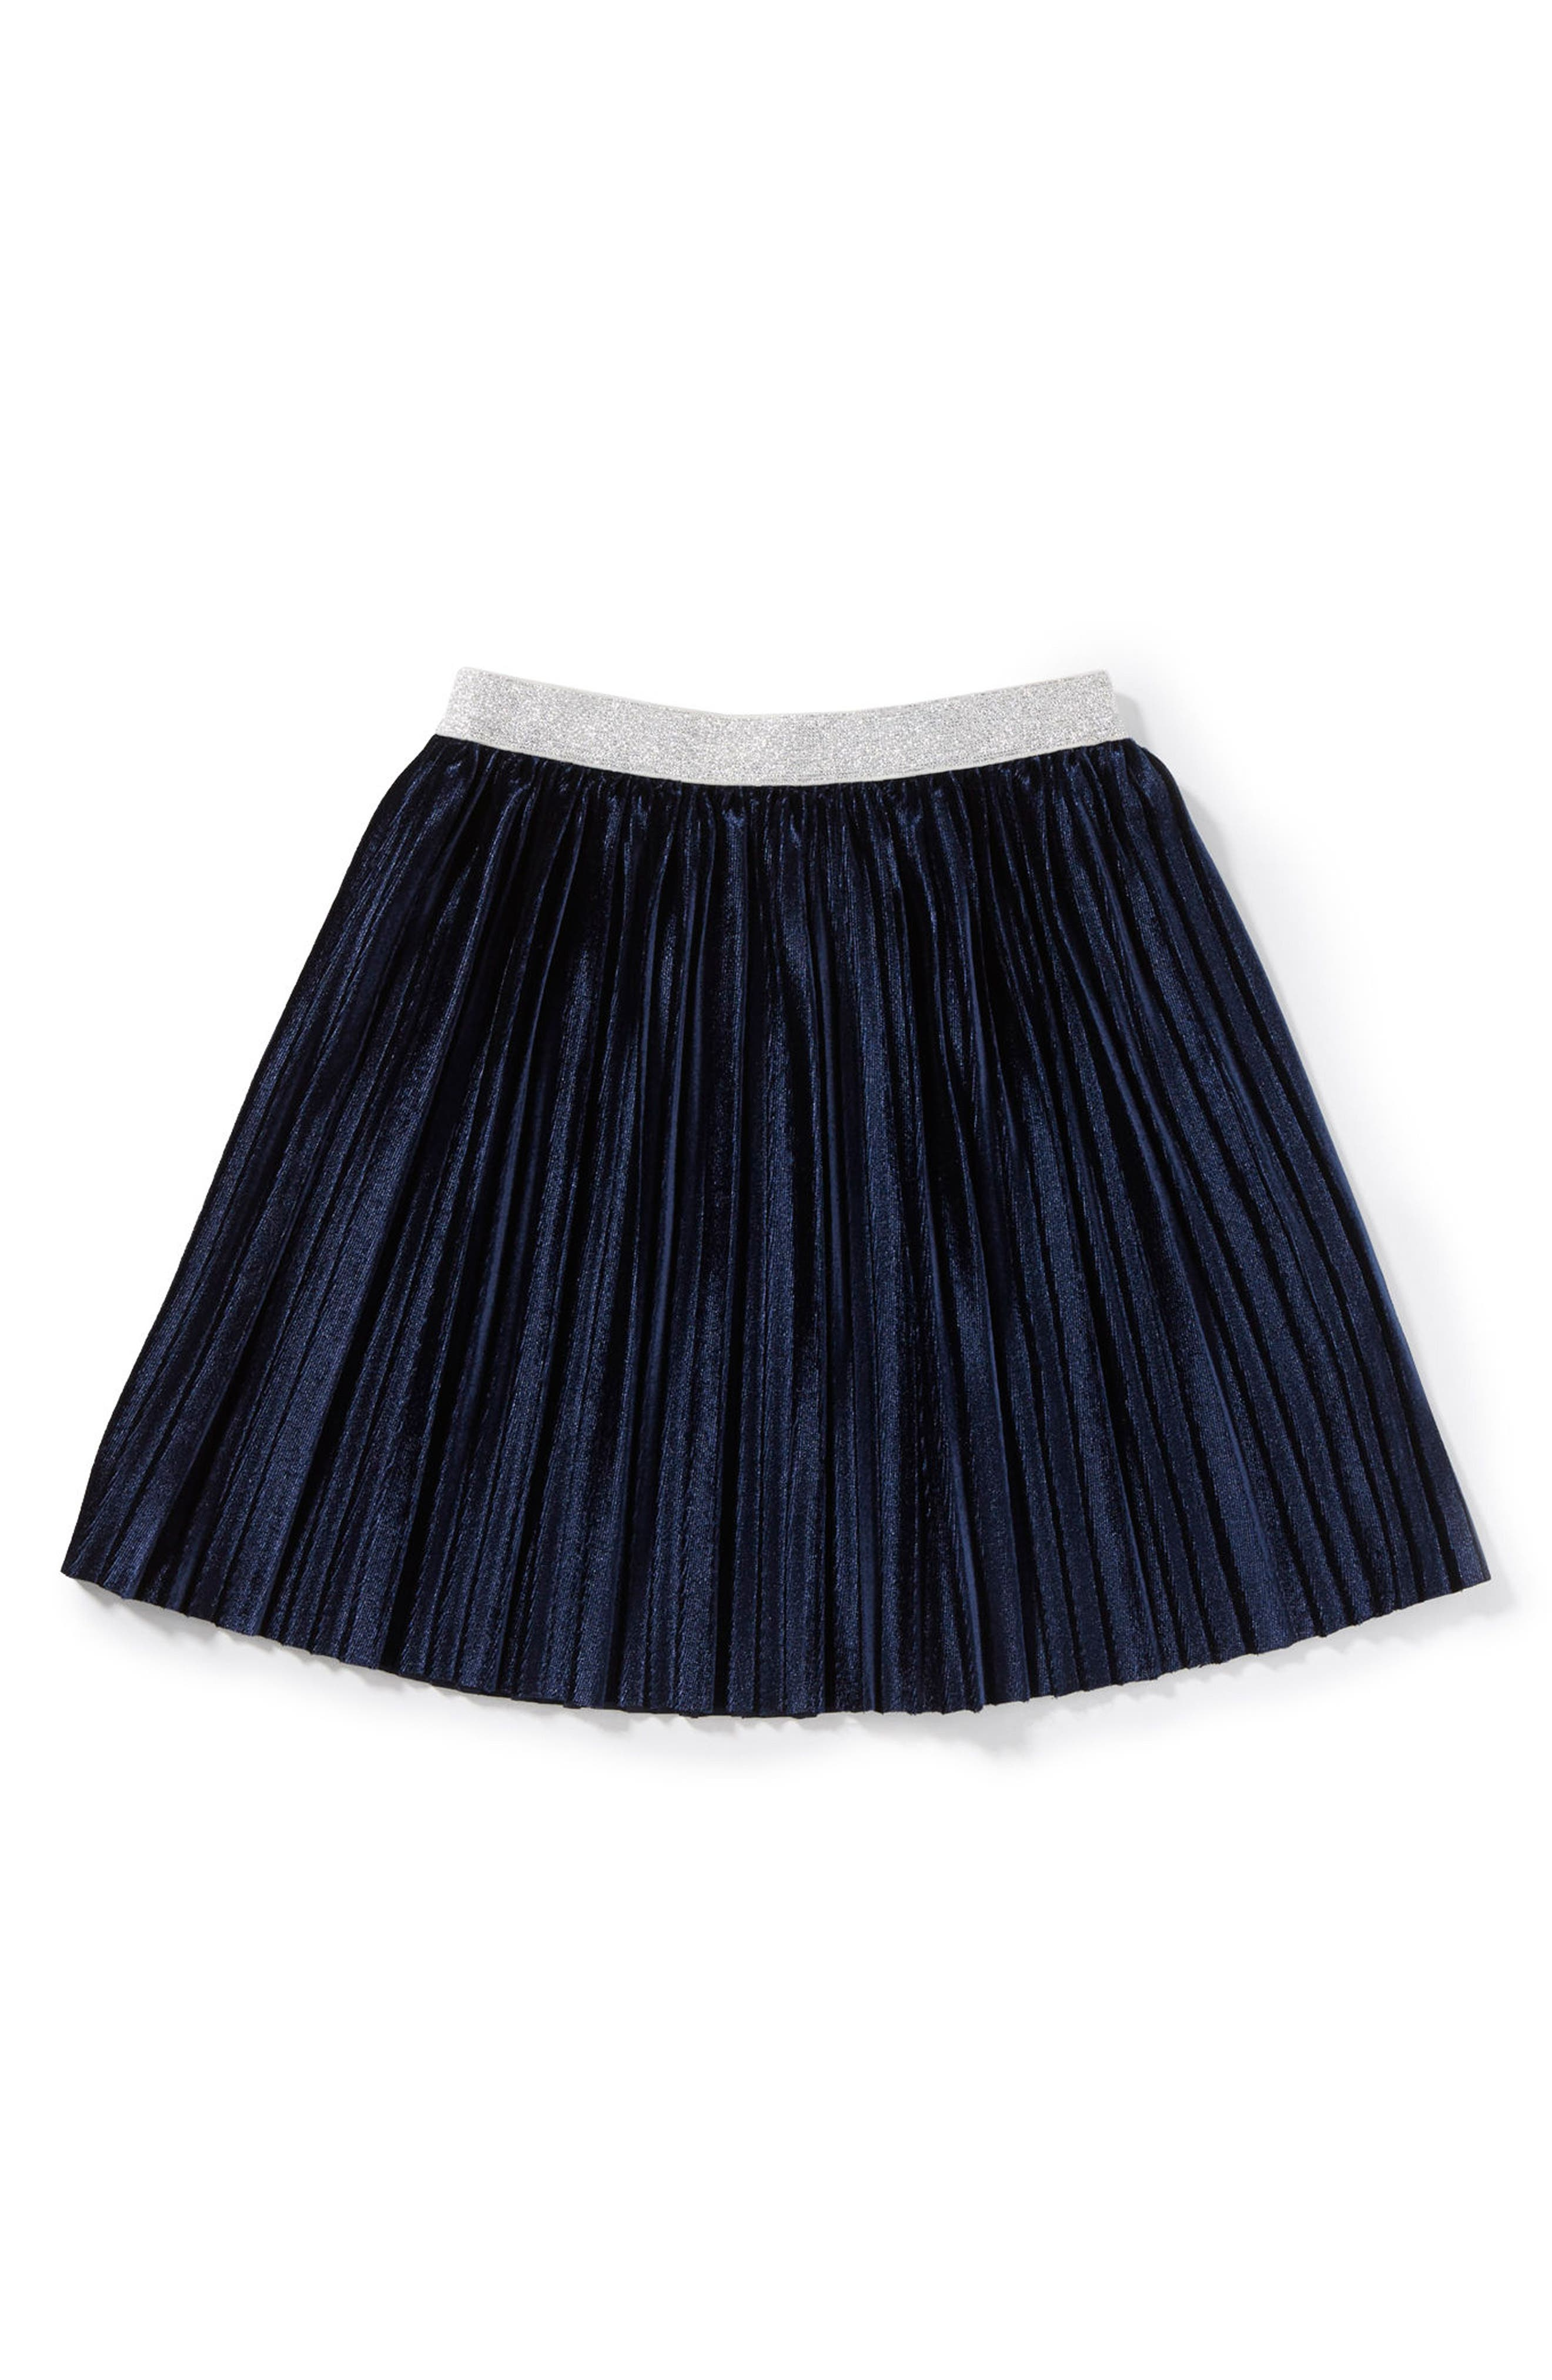 Marissa Pleated Skirt,                         Main,                         color, Navy